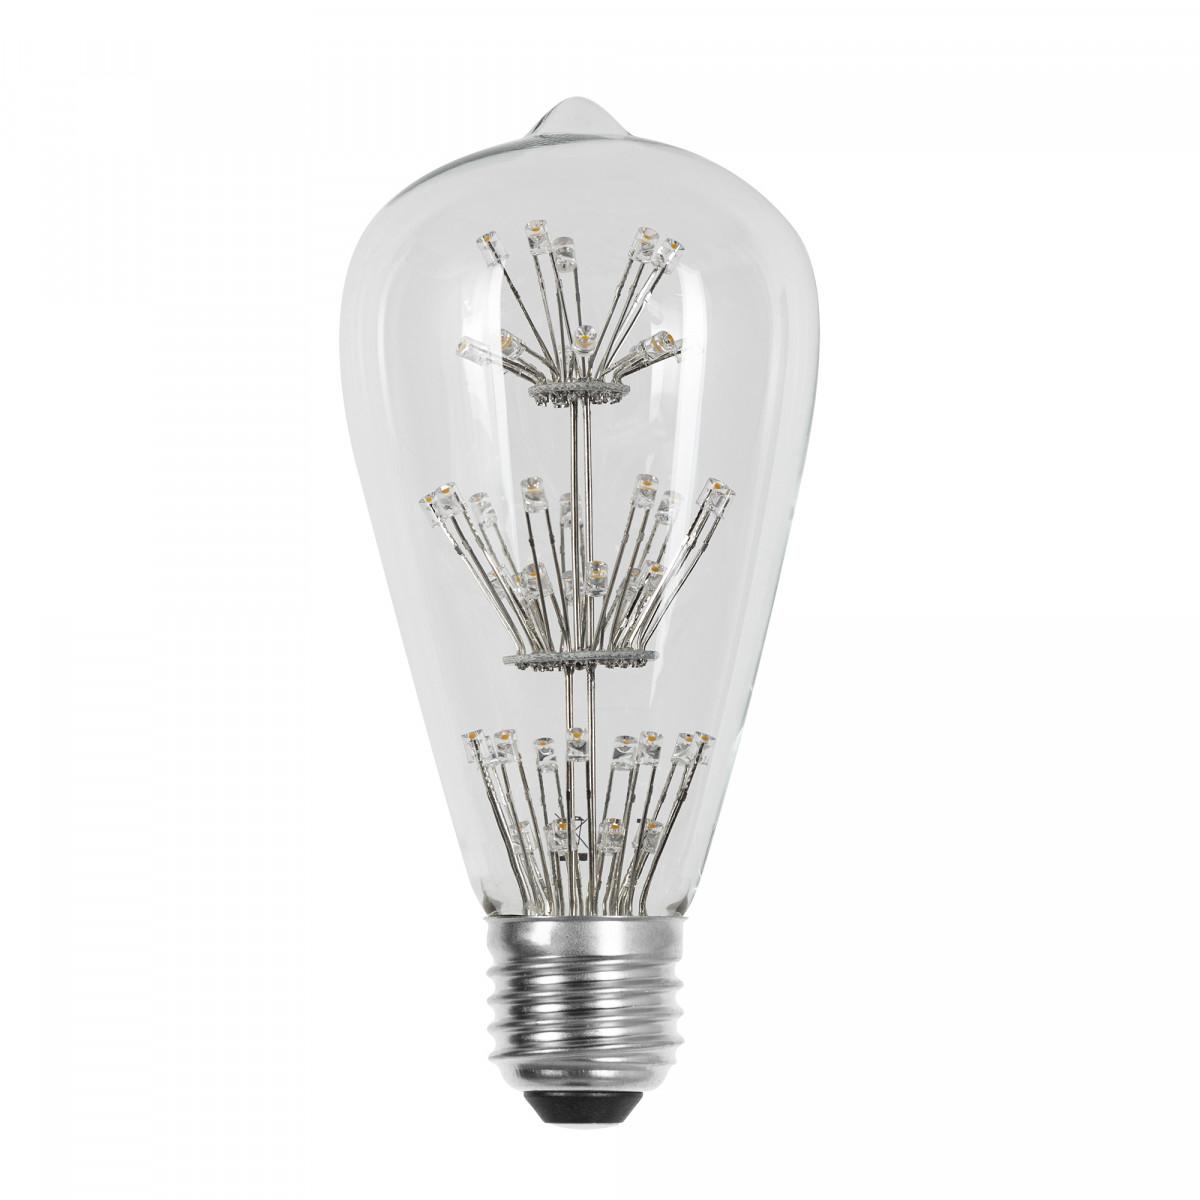 6-pack Rustic led lamp 5882x6 - aanbieding ledlampen